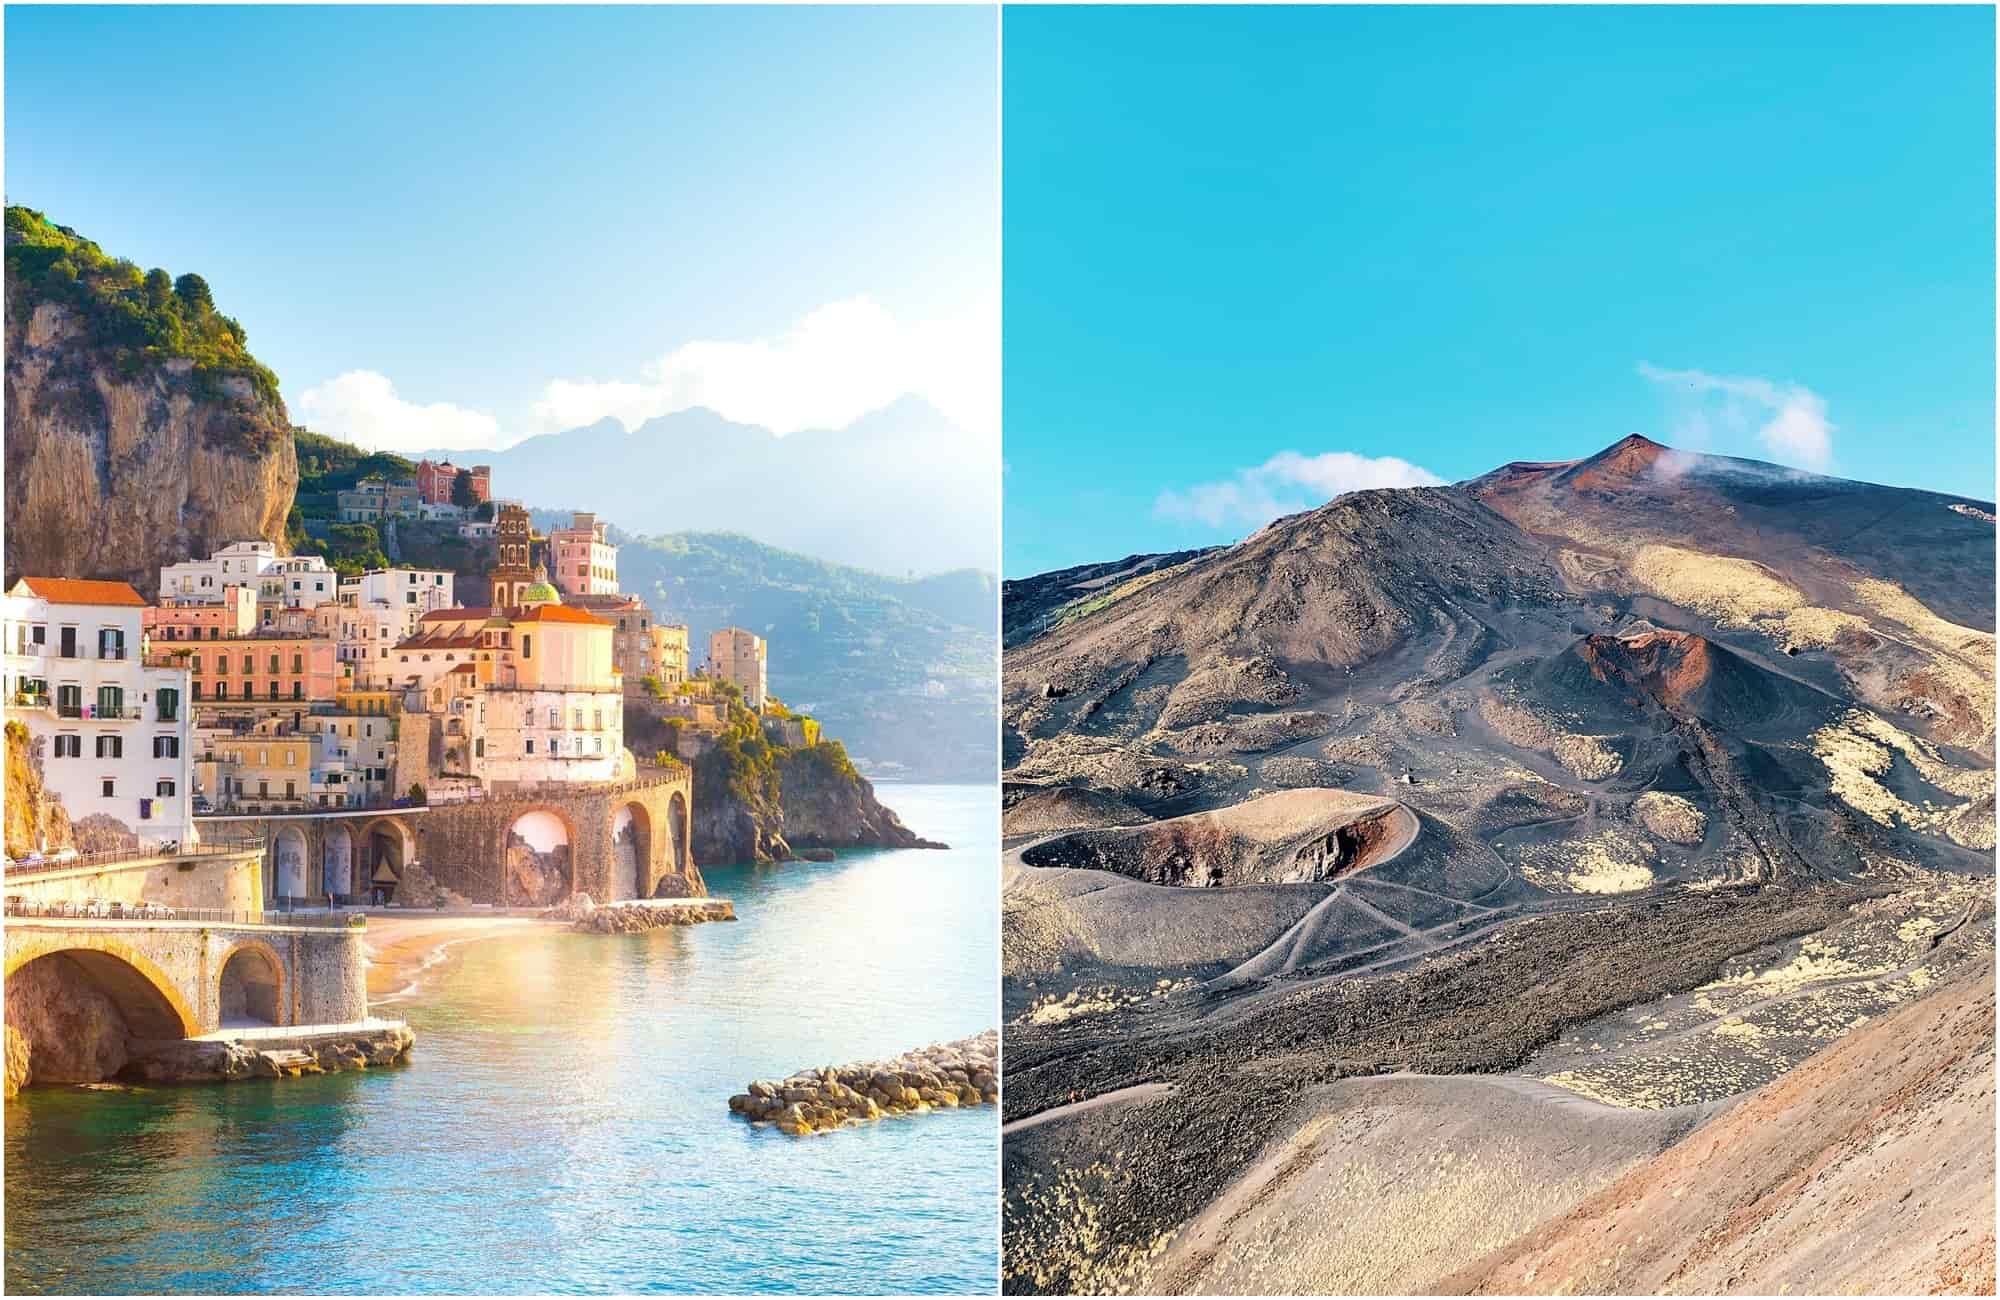 Voyage Italie - Amalfi - Etna - Amplitudes